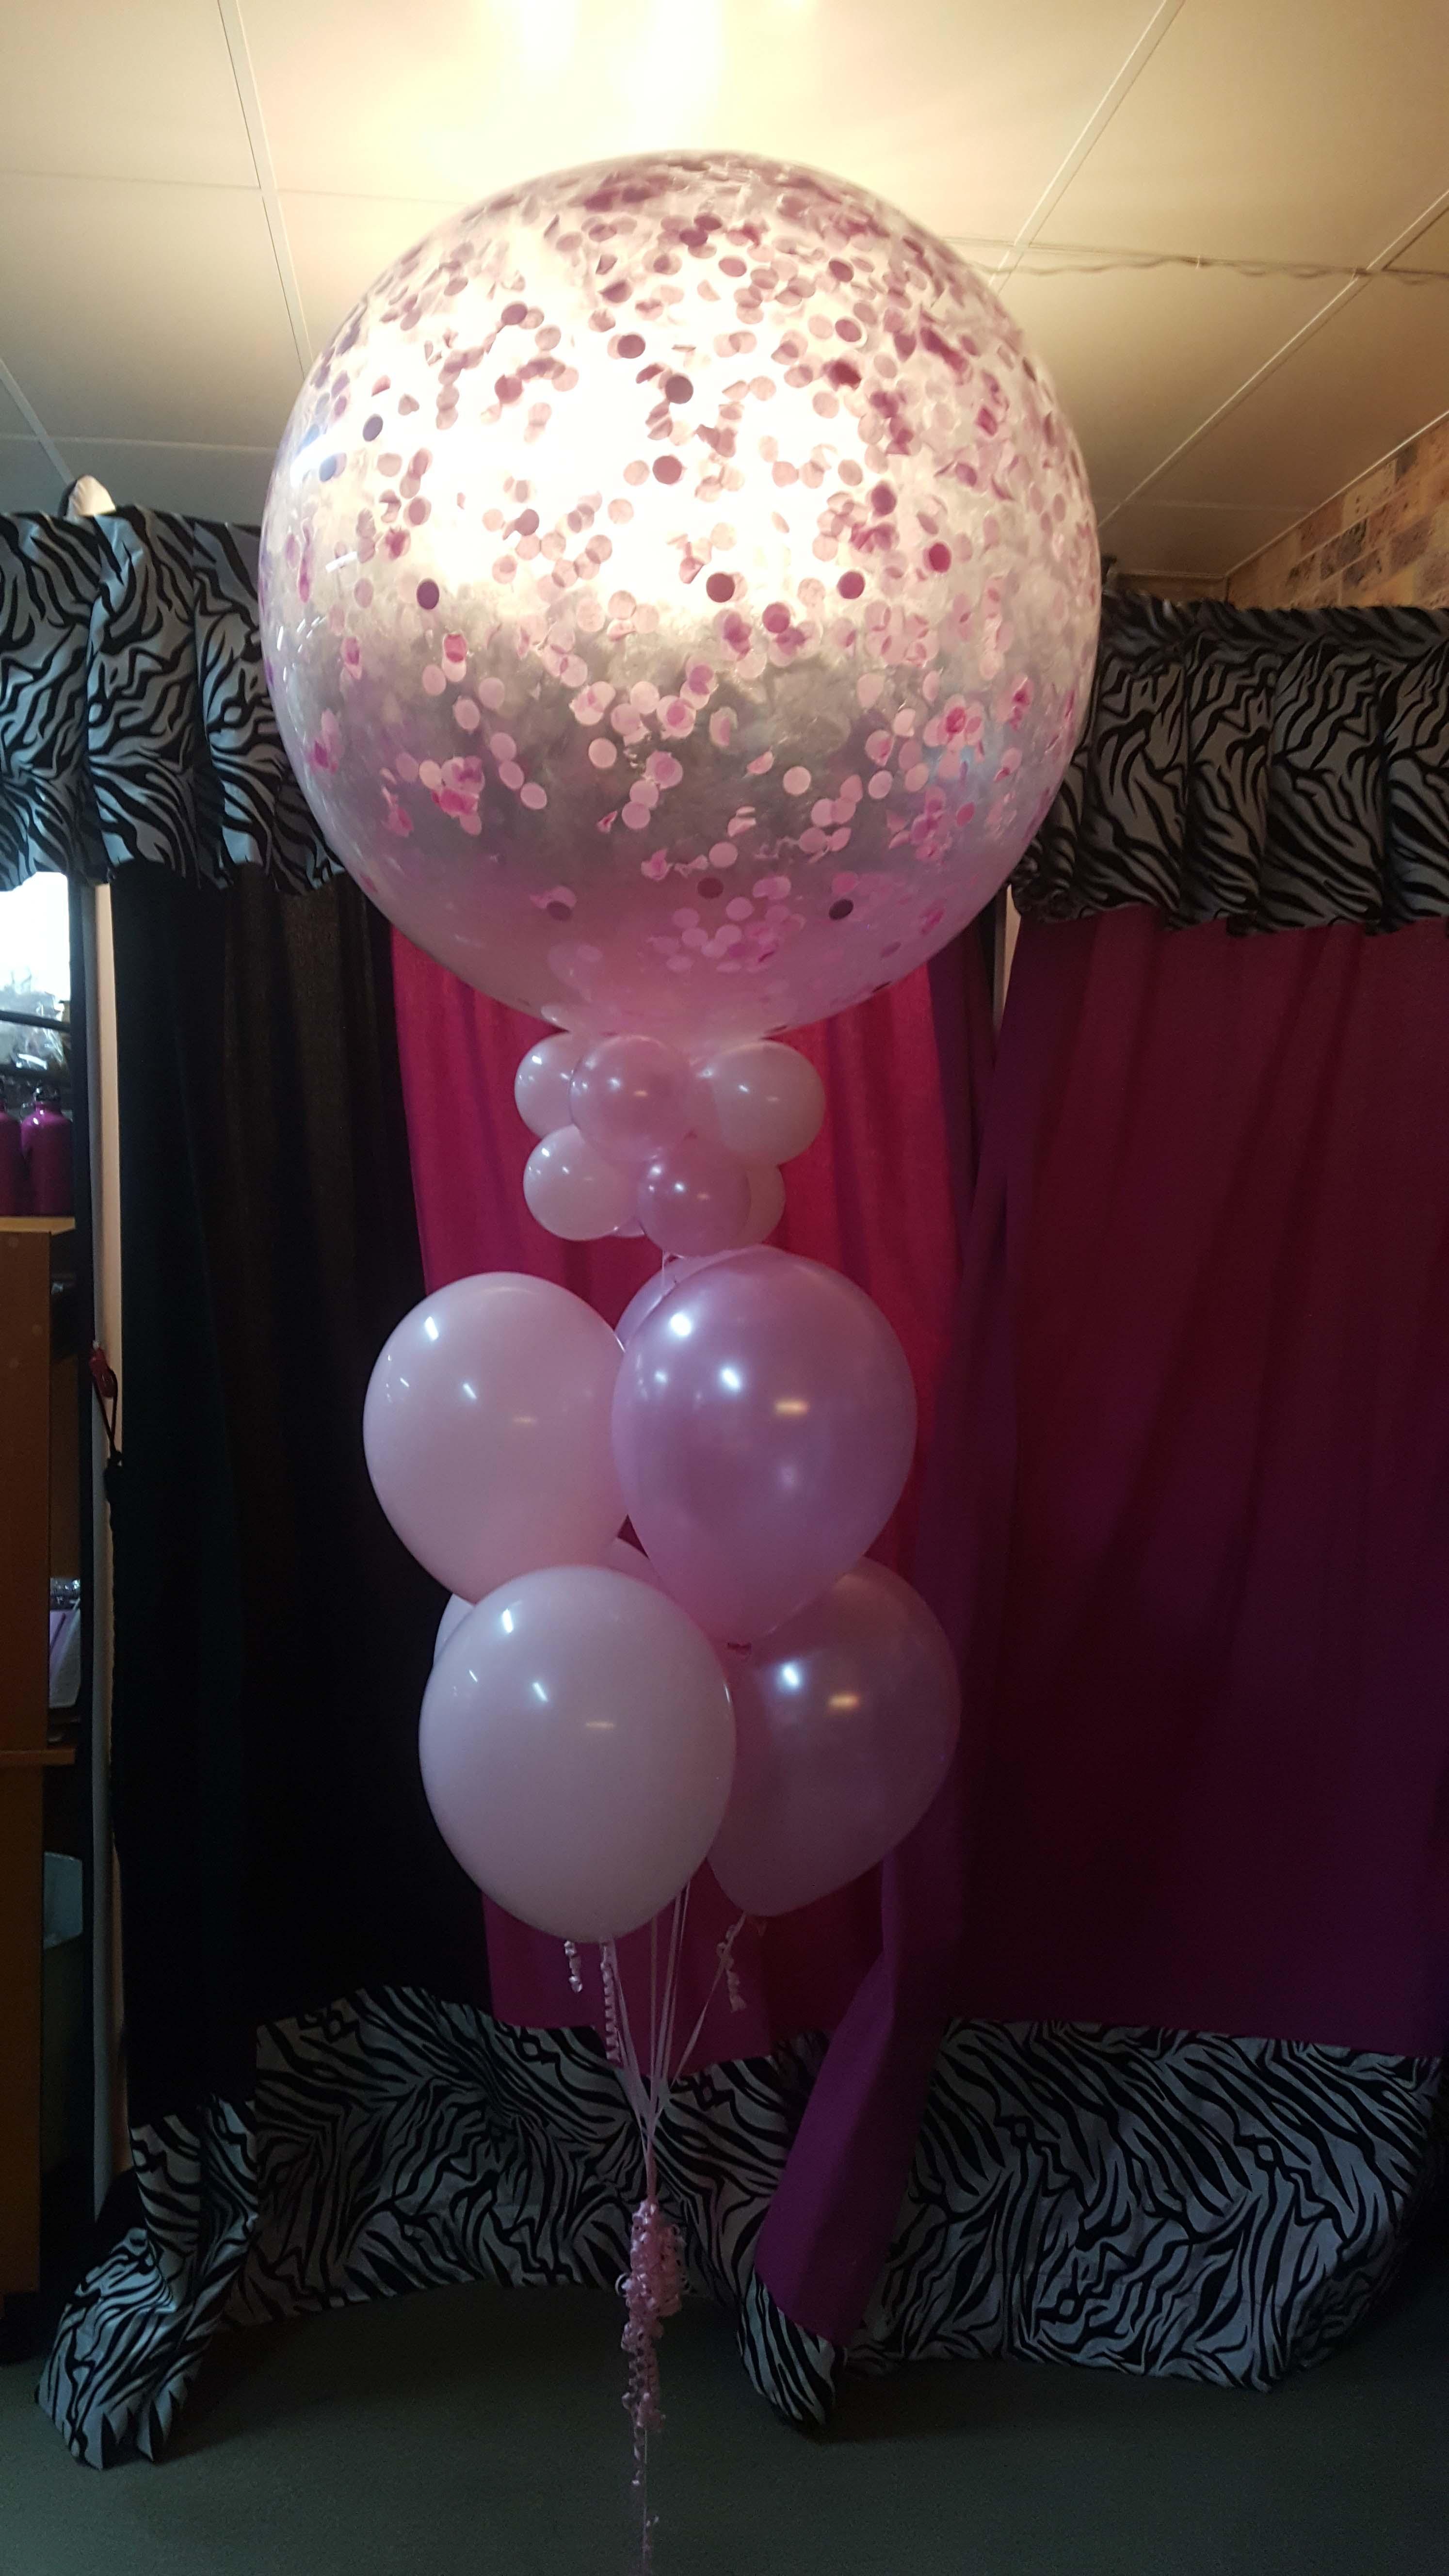 Giant Confetti Balloon Arrangement $80